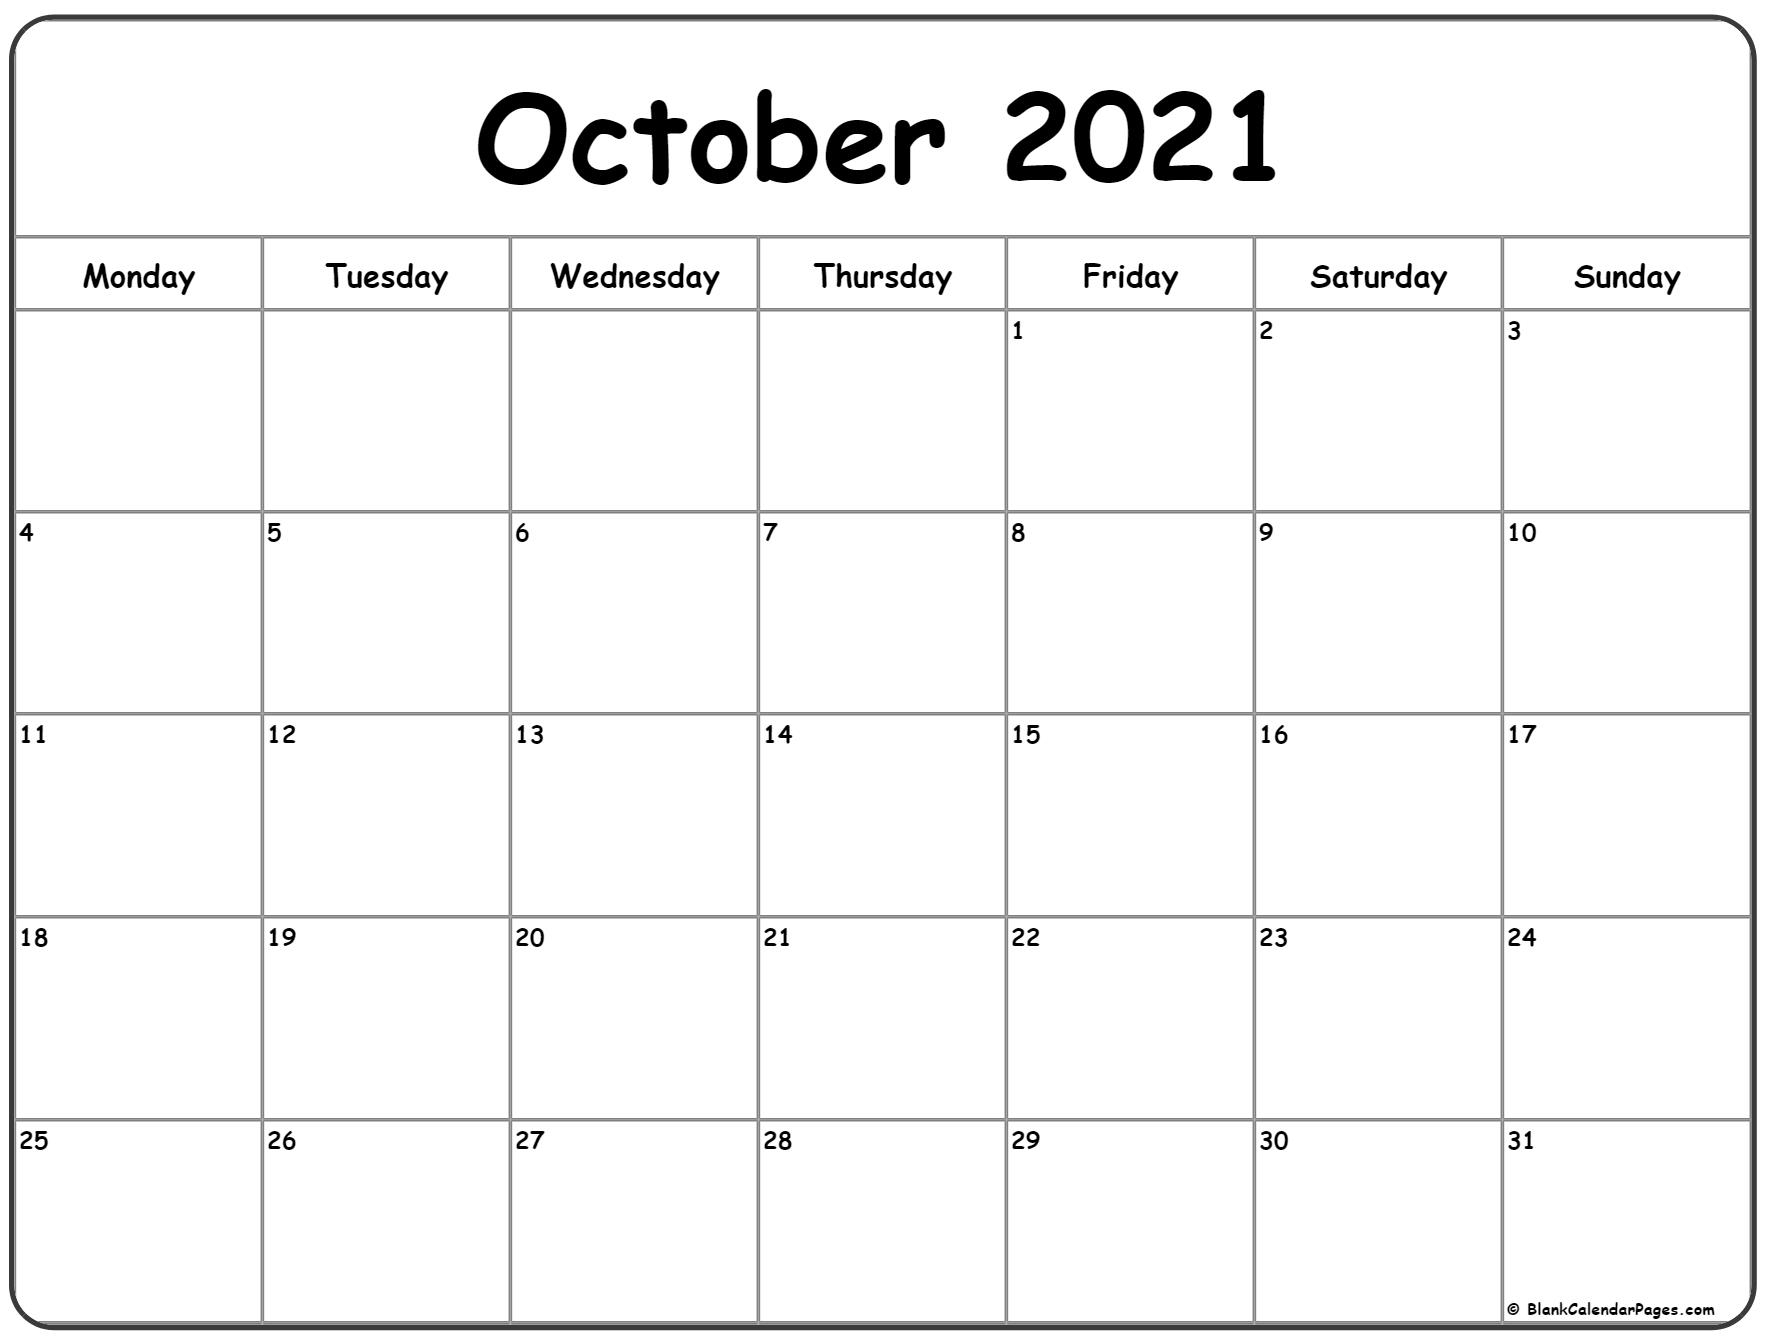 Get October 2021 Calendar